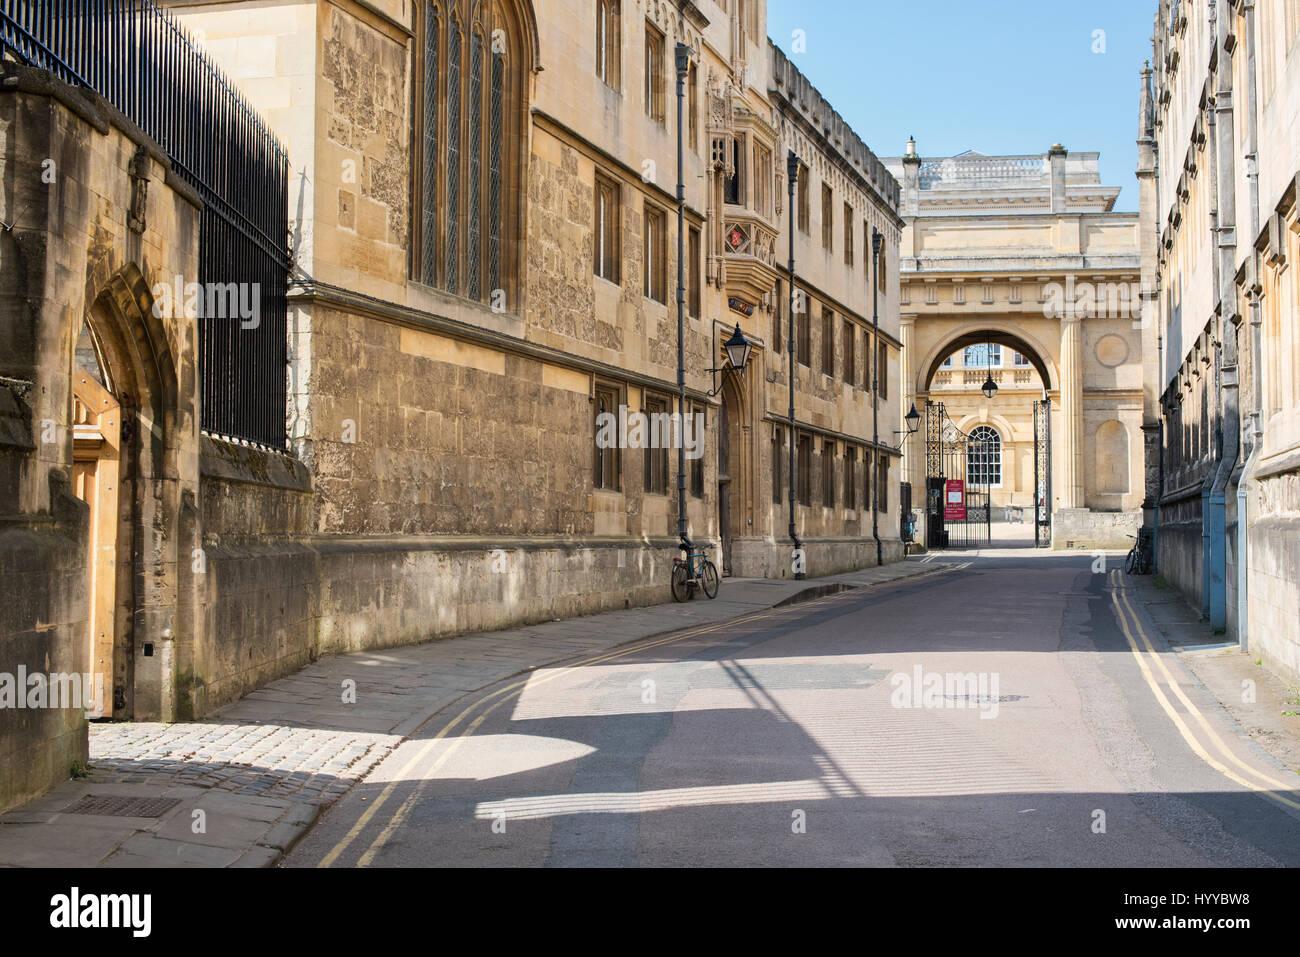 Merton Street showing Corpus Christi College. Oxford, Oxfordshire, UK - Stock Image